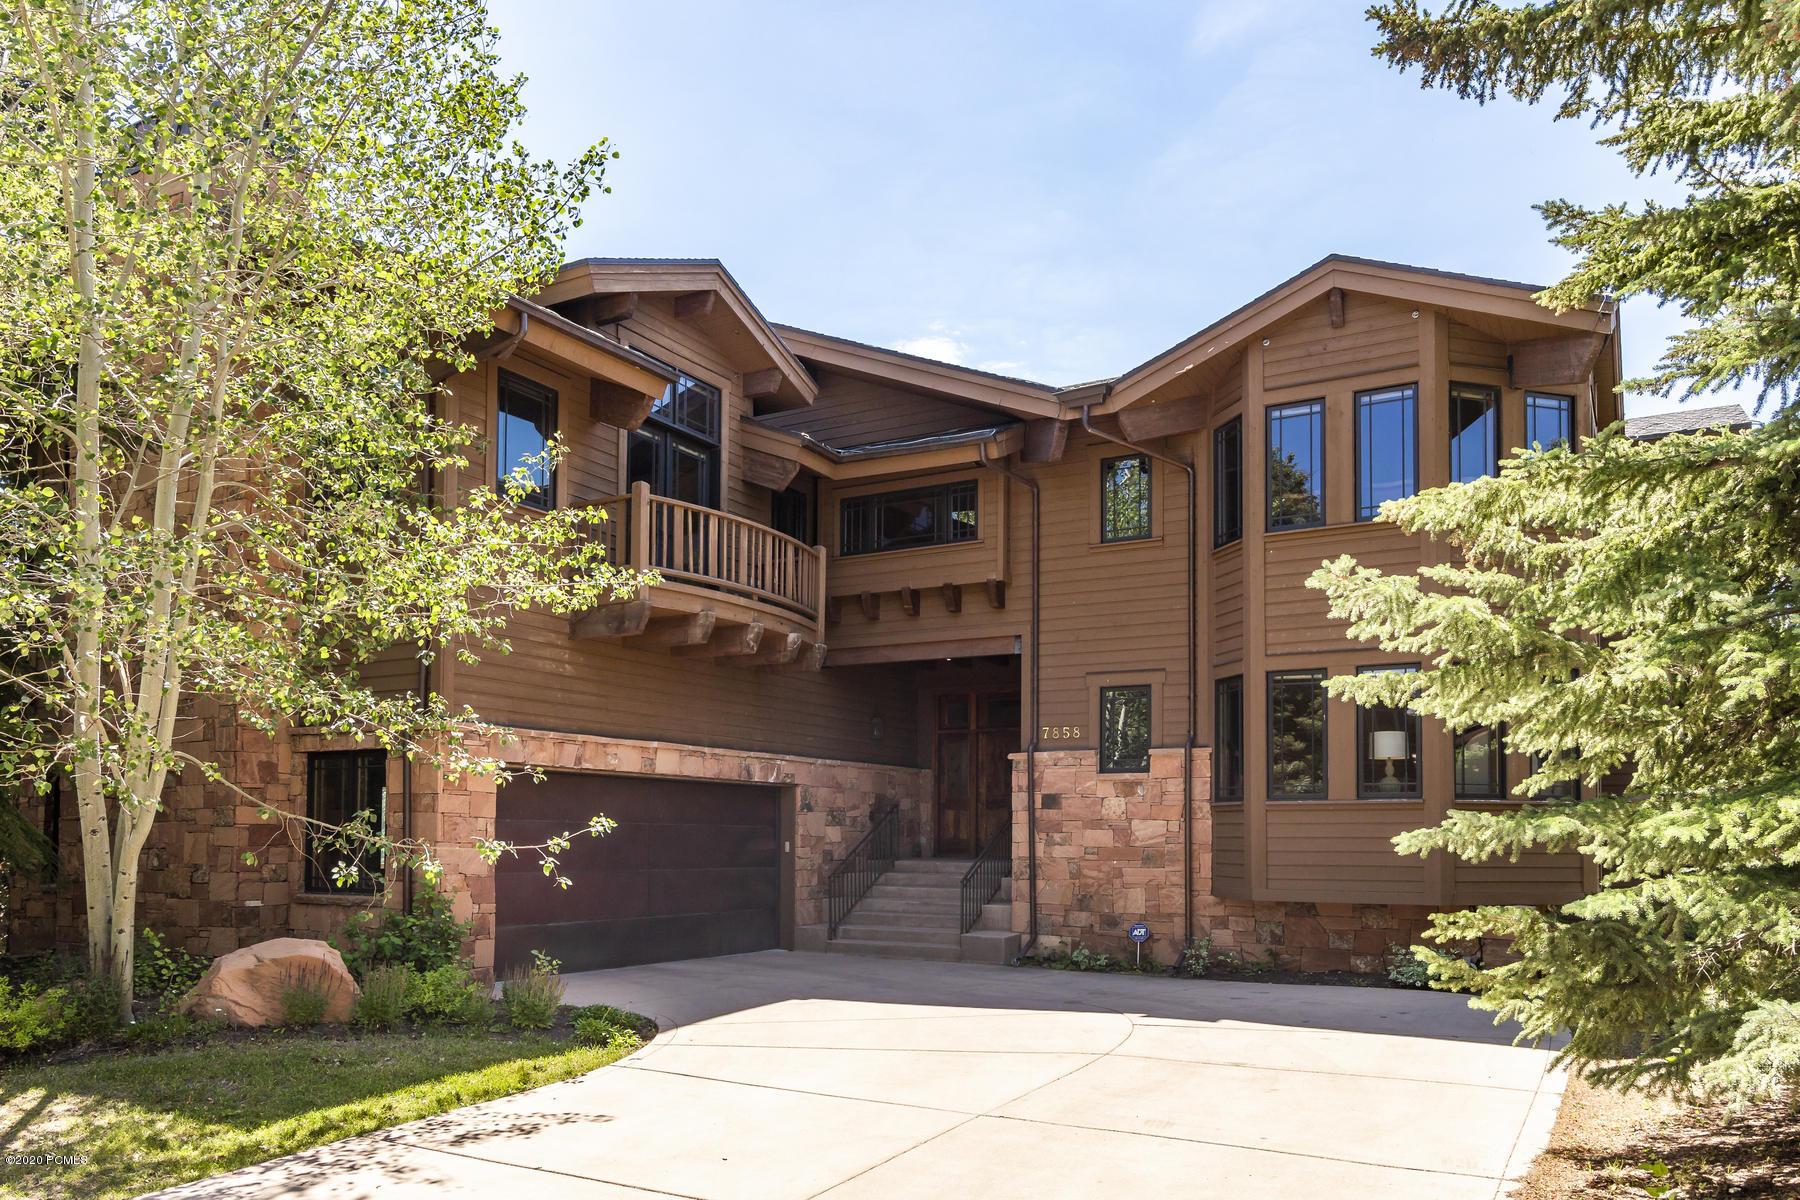 7858 Aster Lane, Park City, Utah 84060, 5 Bedrooms Bedrooms, ,7 BathroomsBathrooms,Single Family,For Sale,Aster,12002811